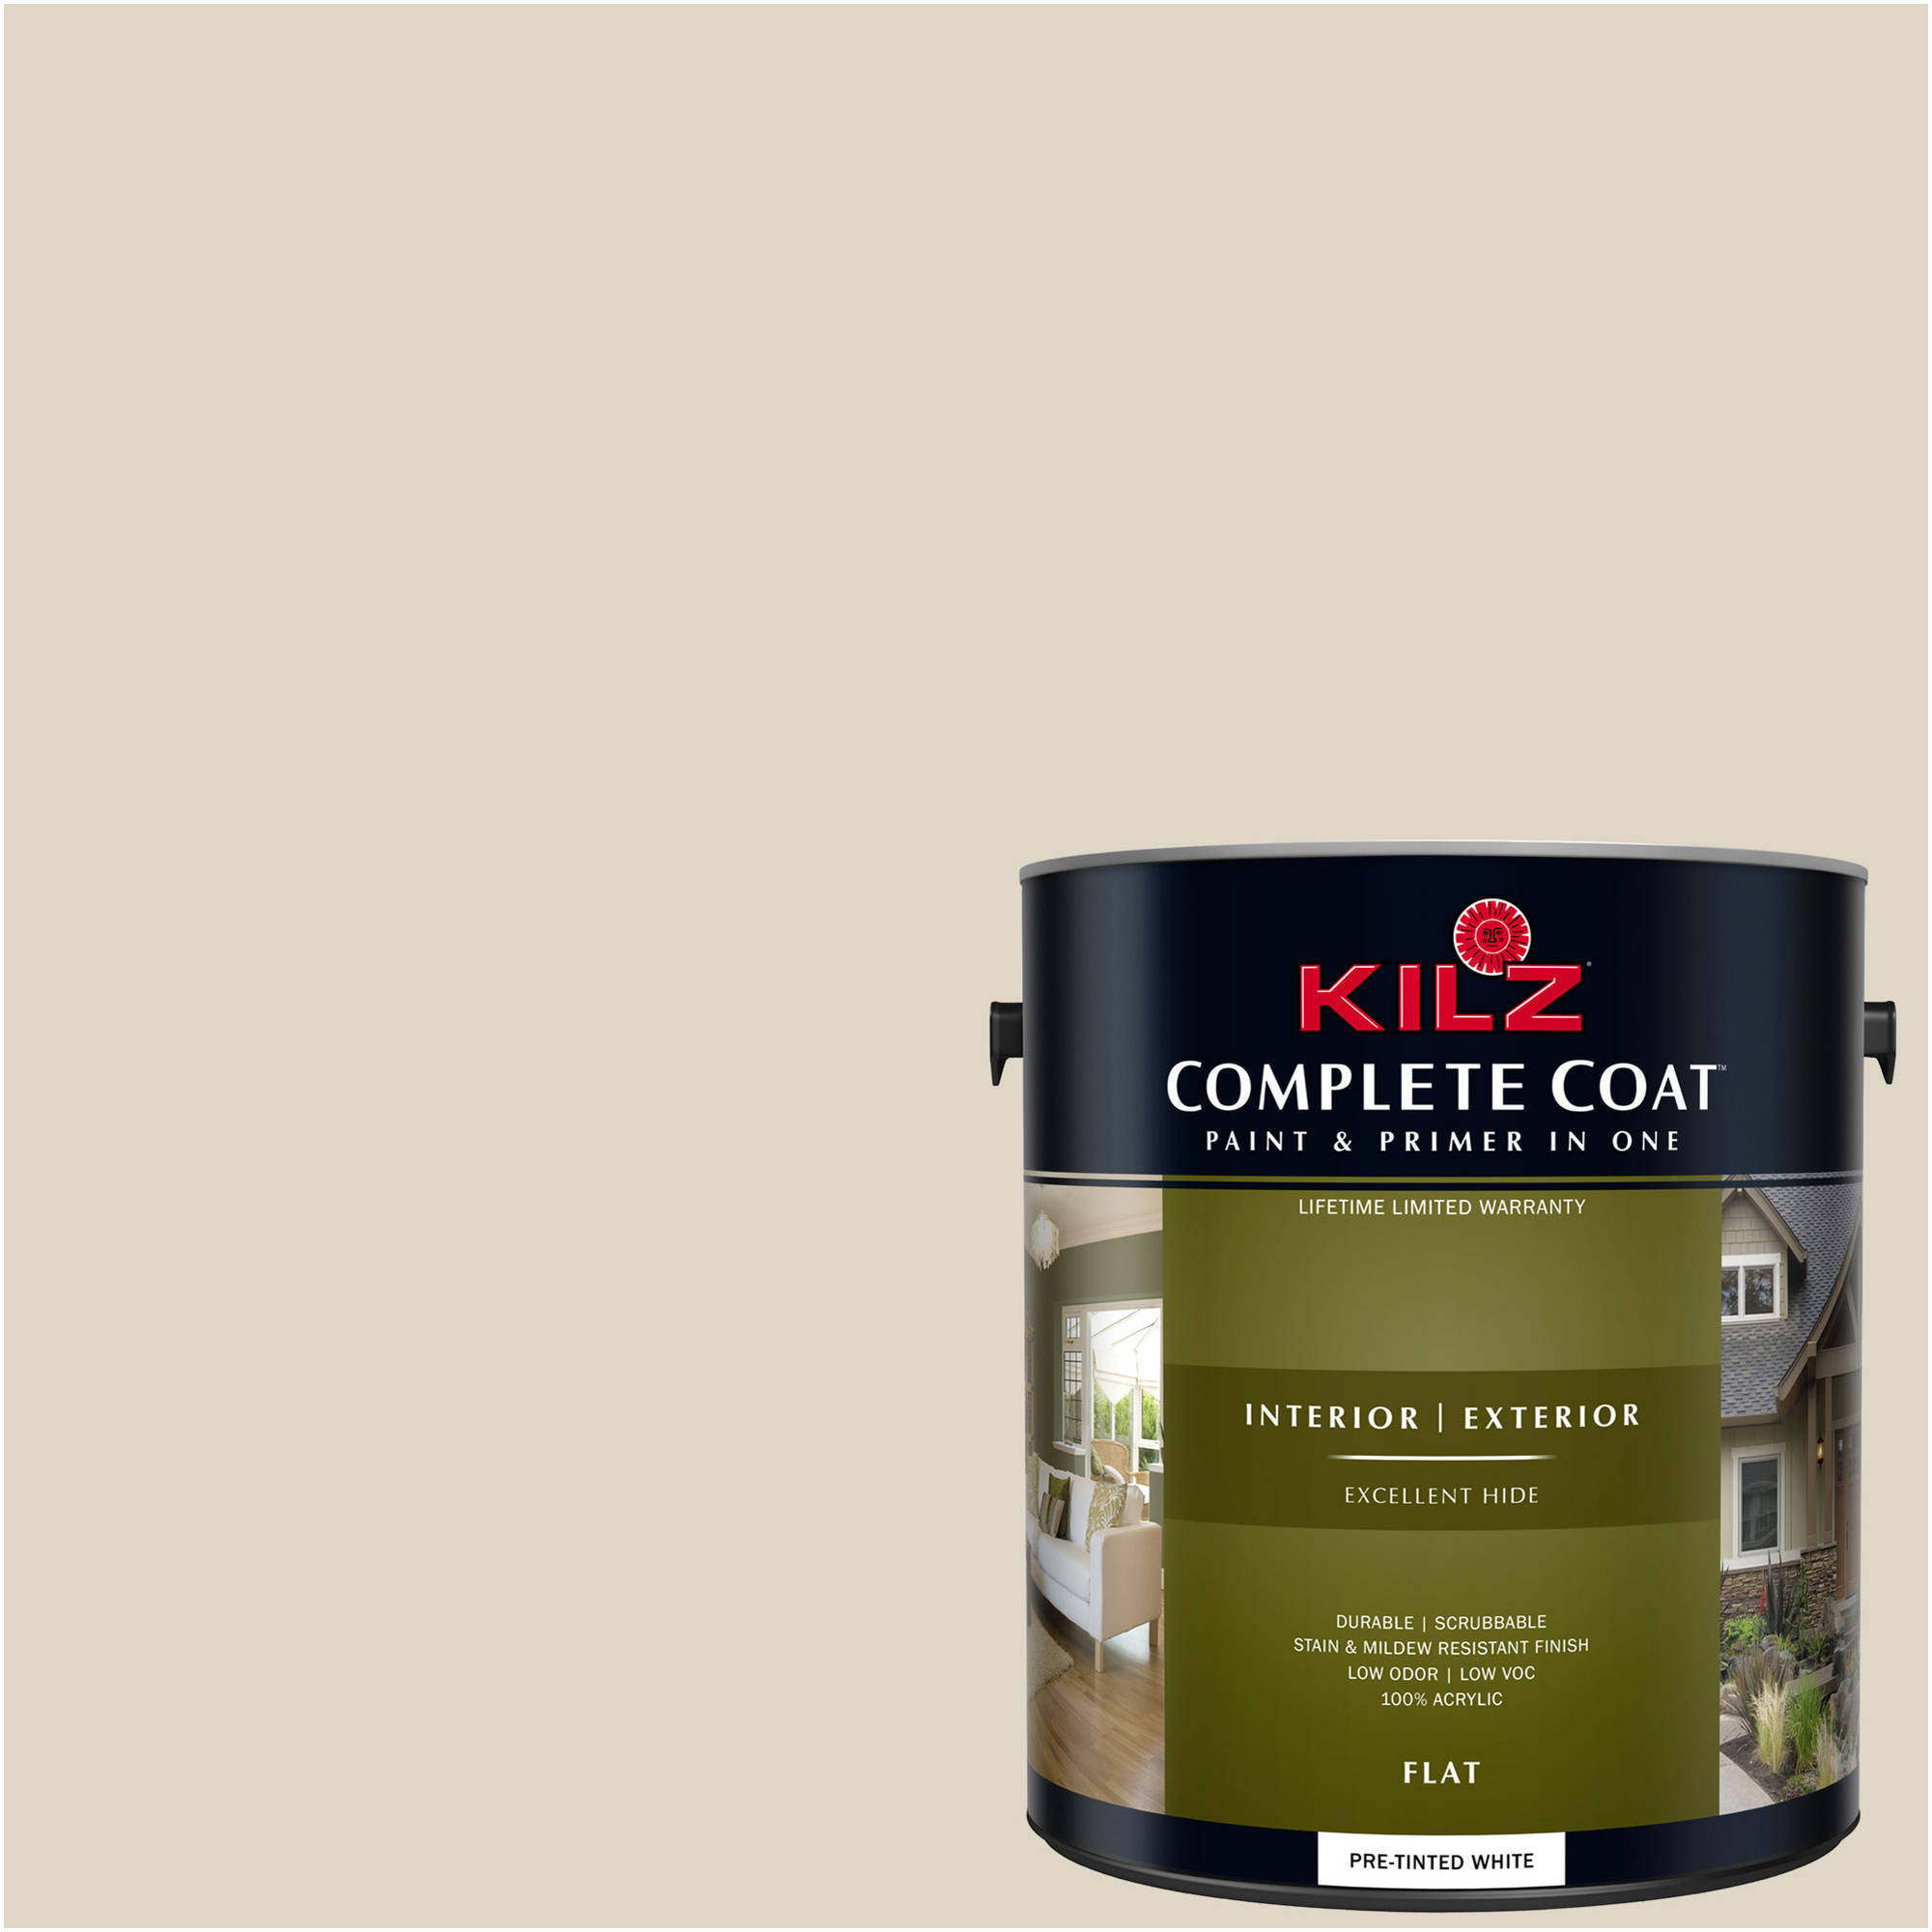 KILZ COMPLETE COAT Interior/Exterior Paint & Primer in One #LK220 October Mist